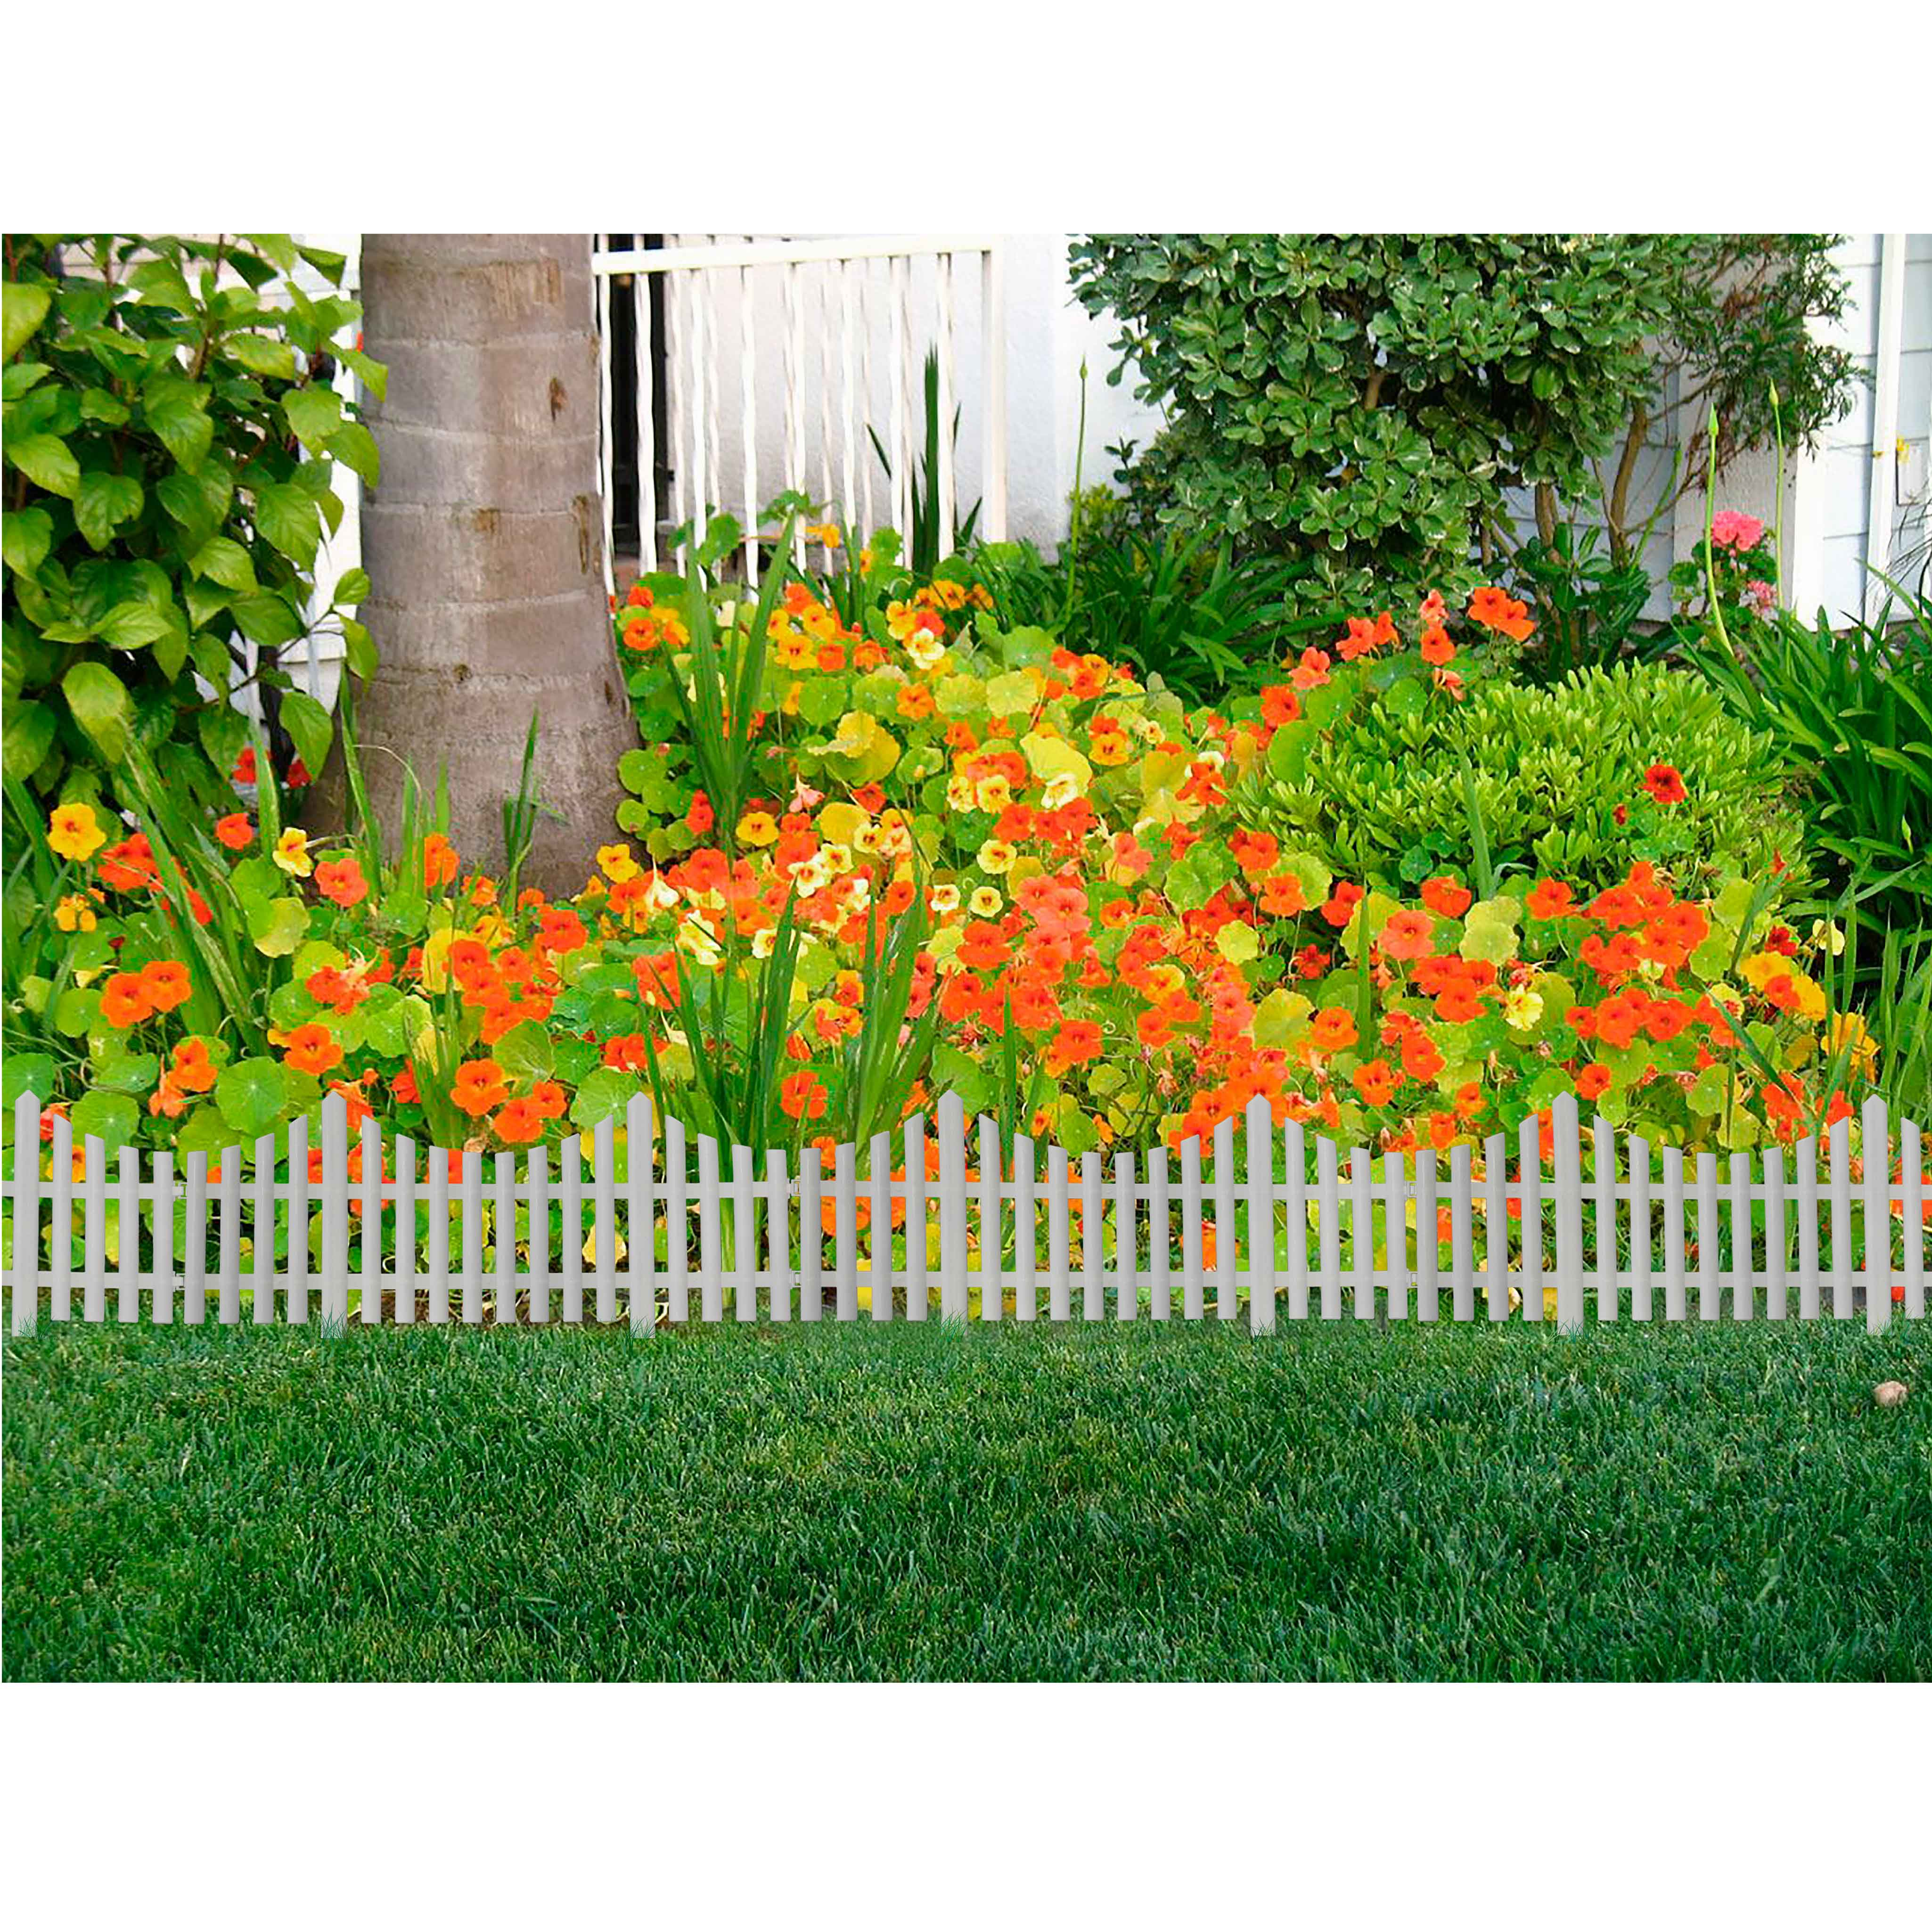 Barrière de jardin blanche 60x32.5cm 4pc - Distriartisan